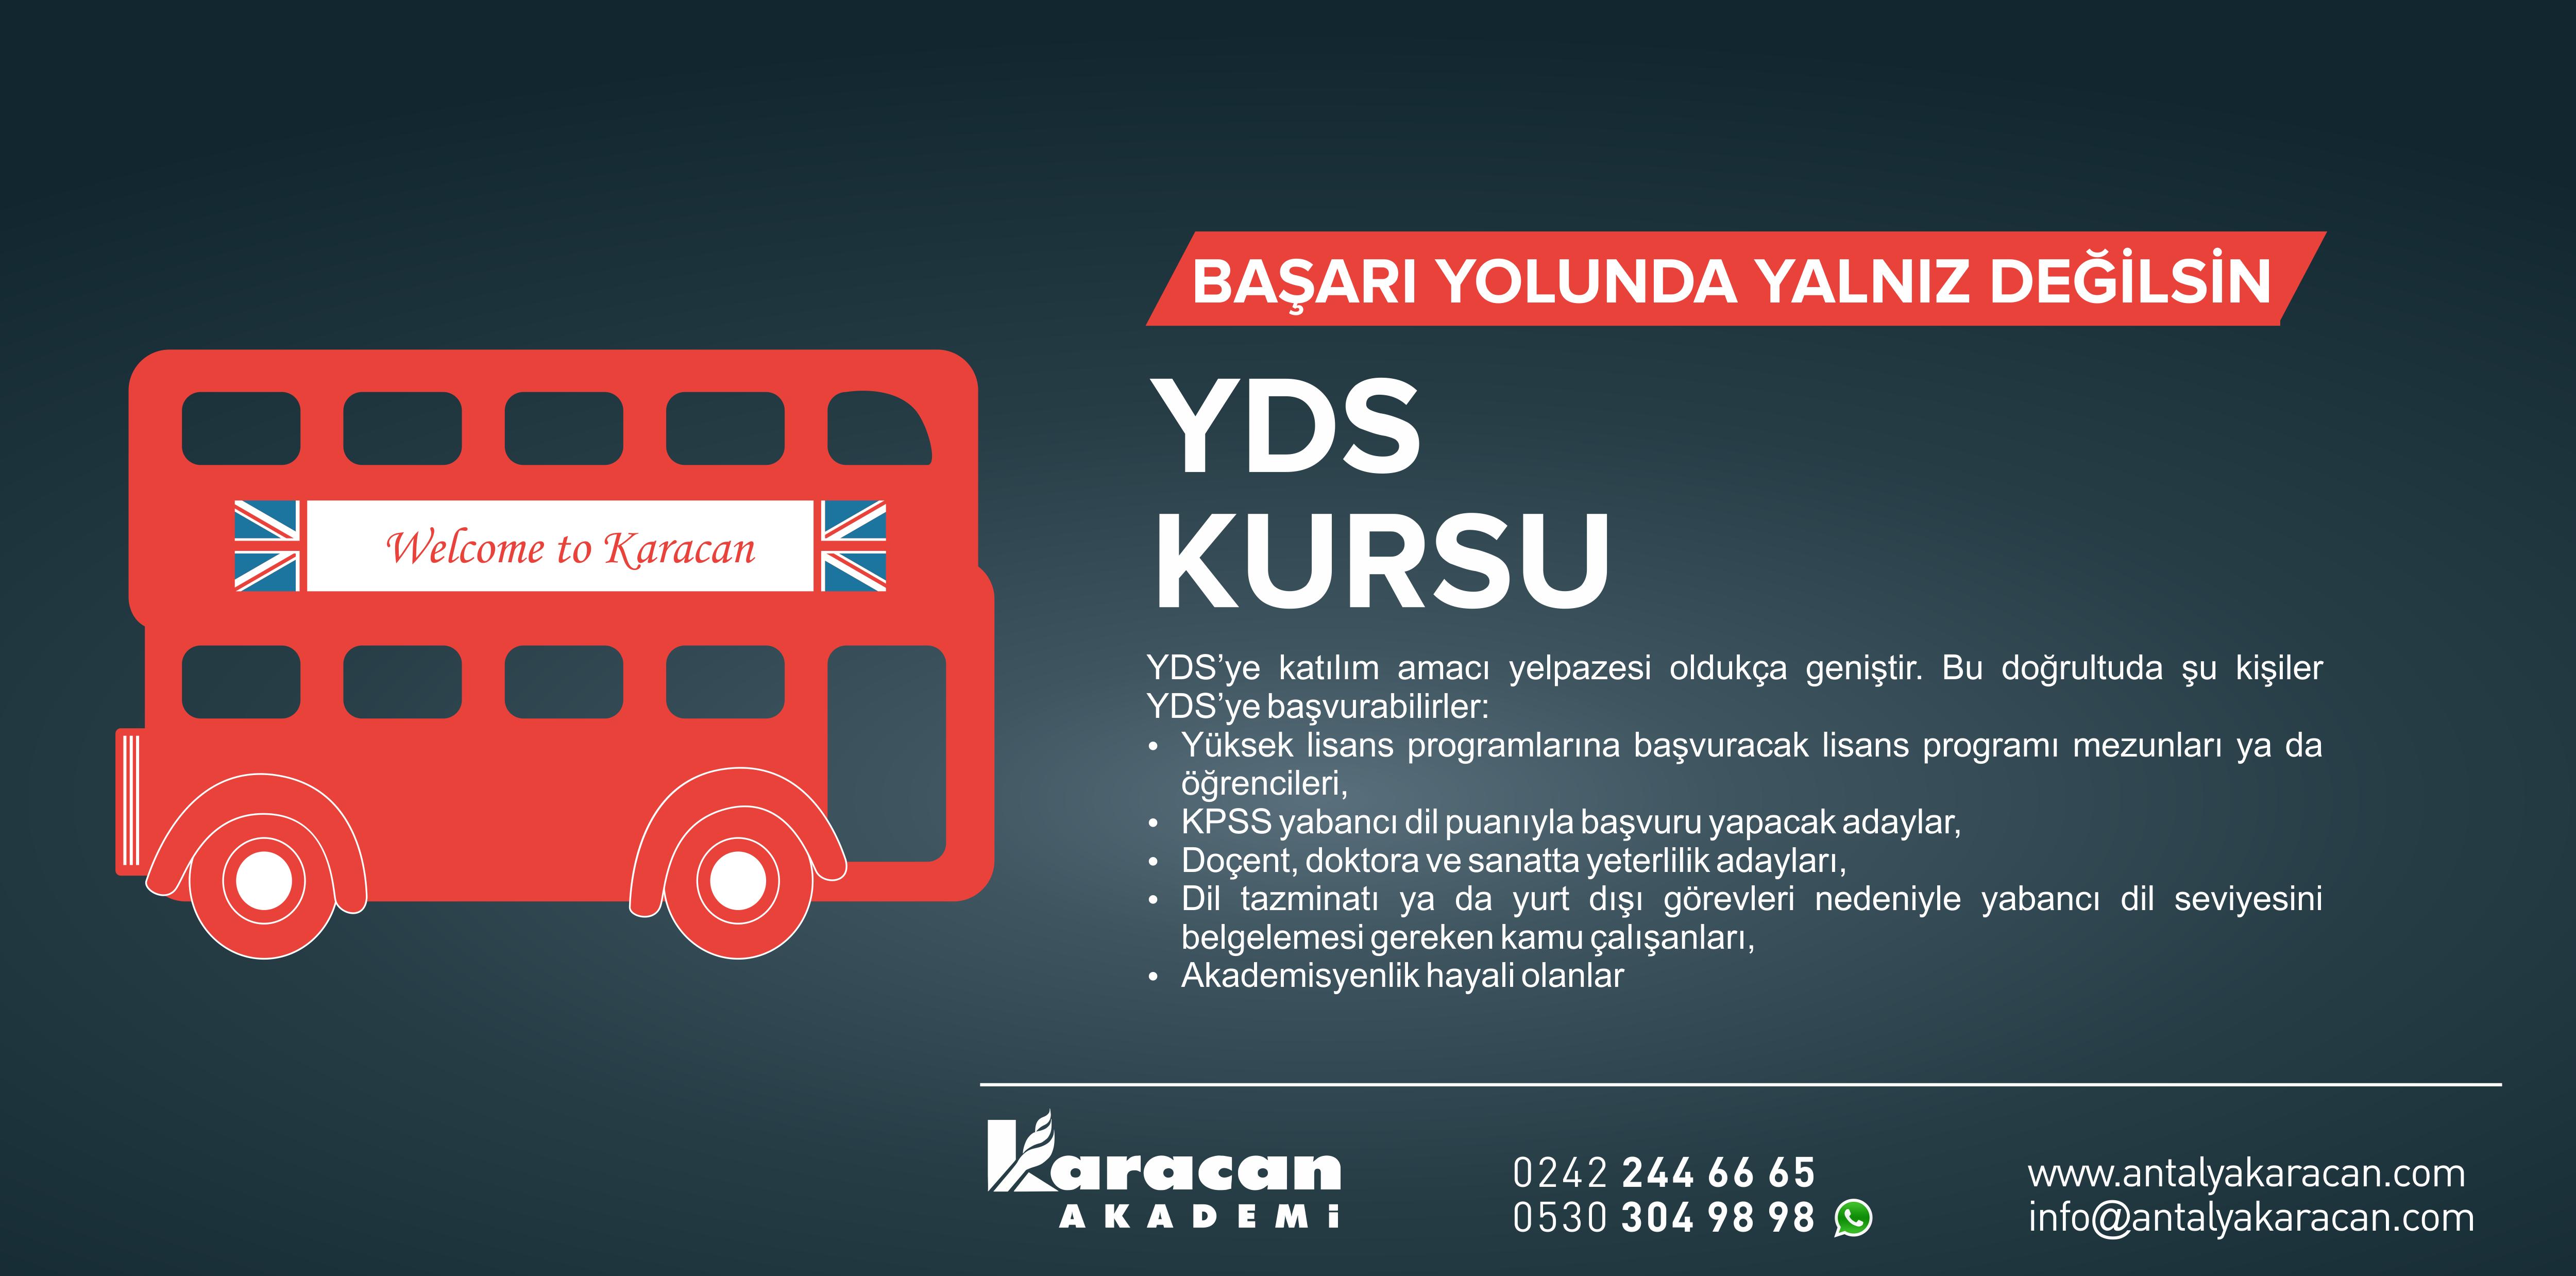 Antalya YDS Kursu (Yabancı Dil Sınavı)